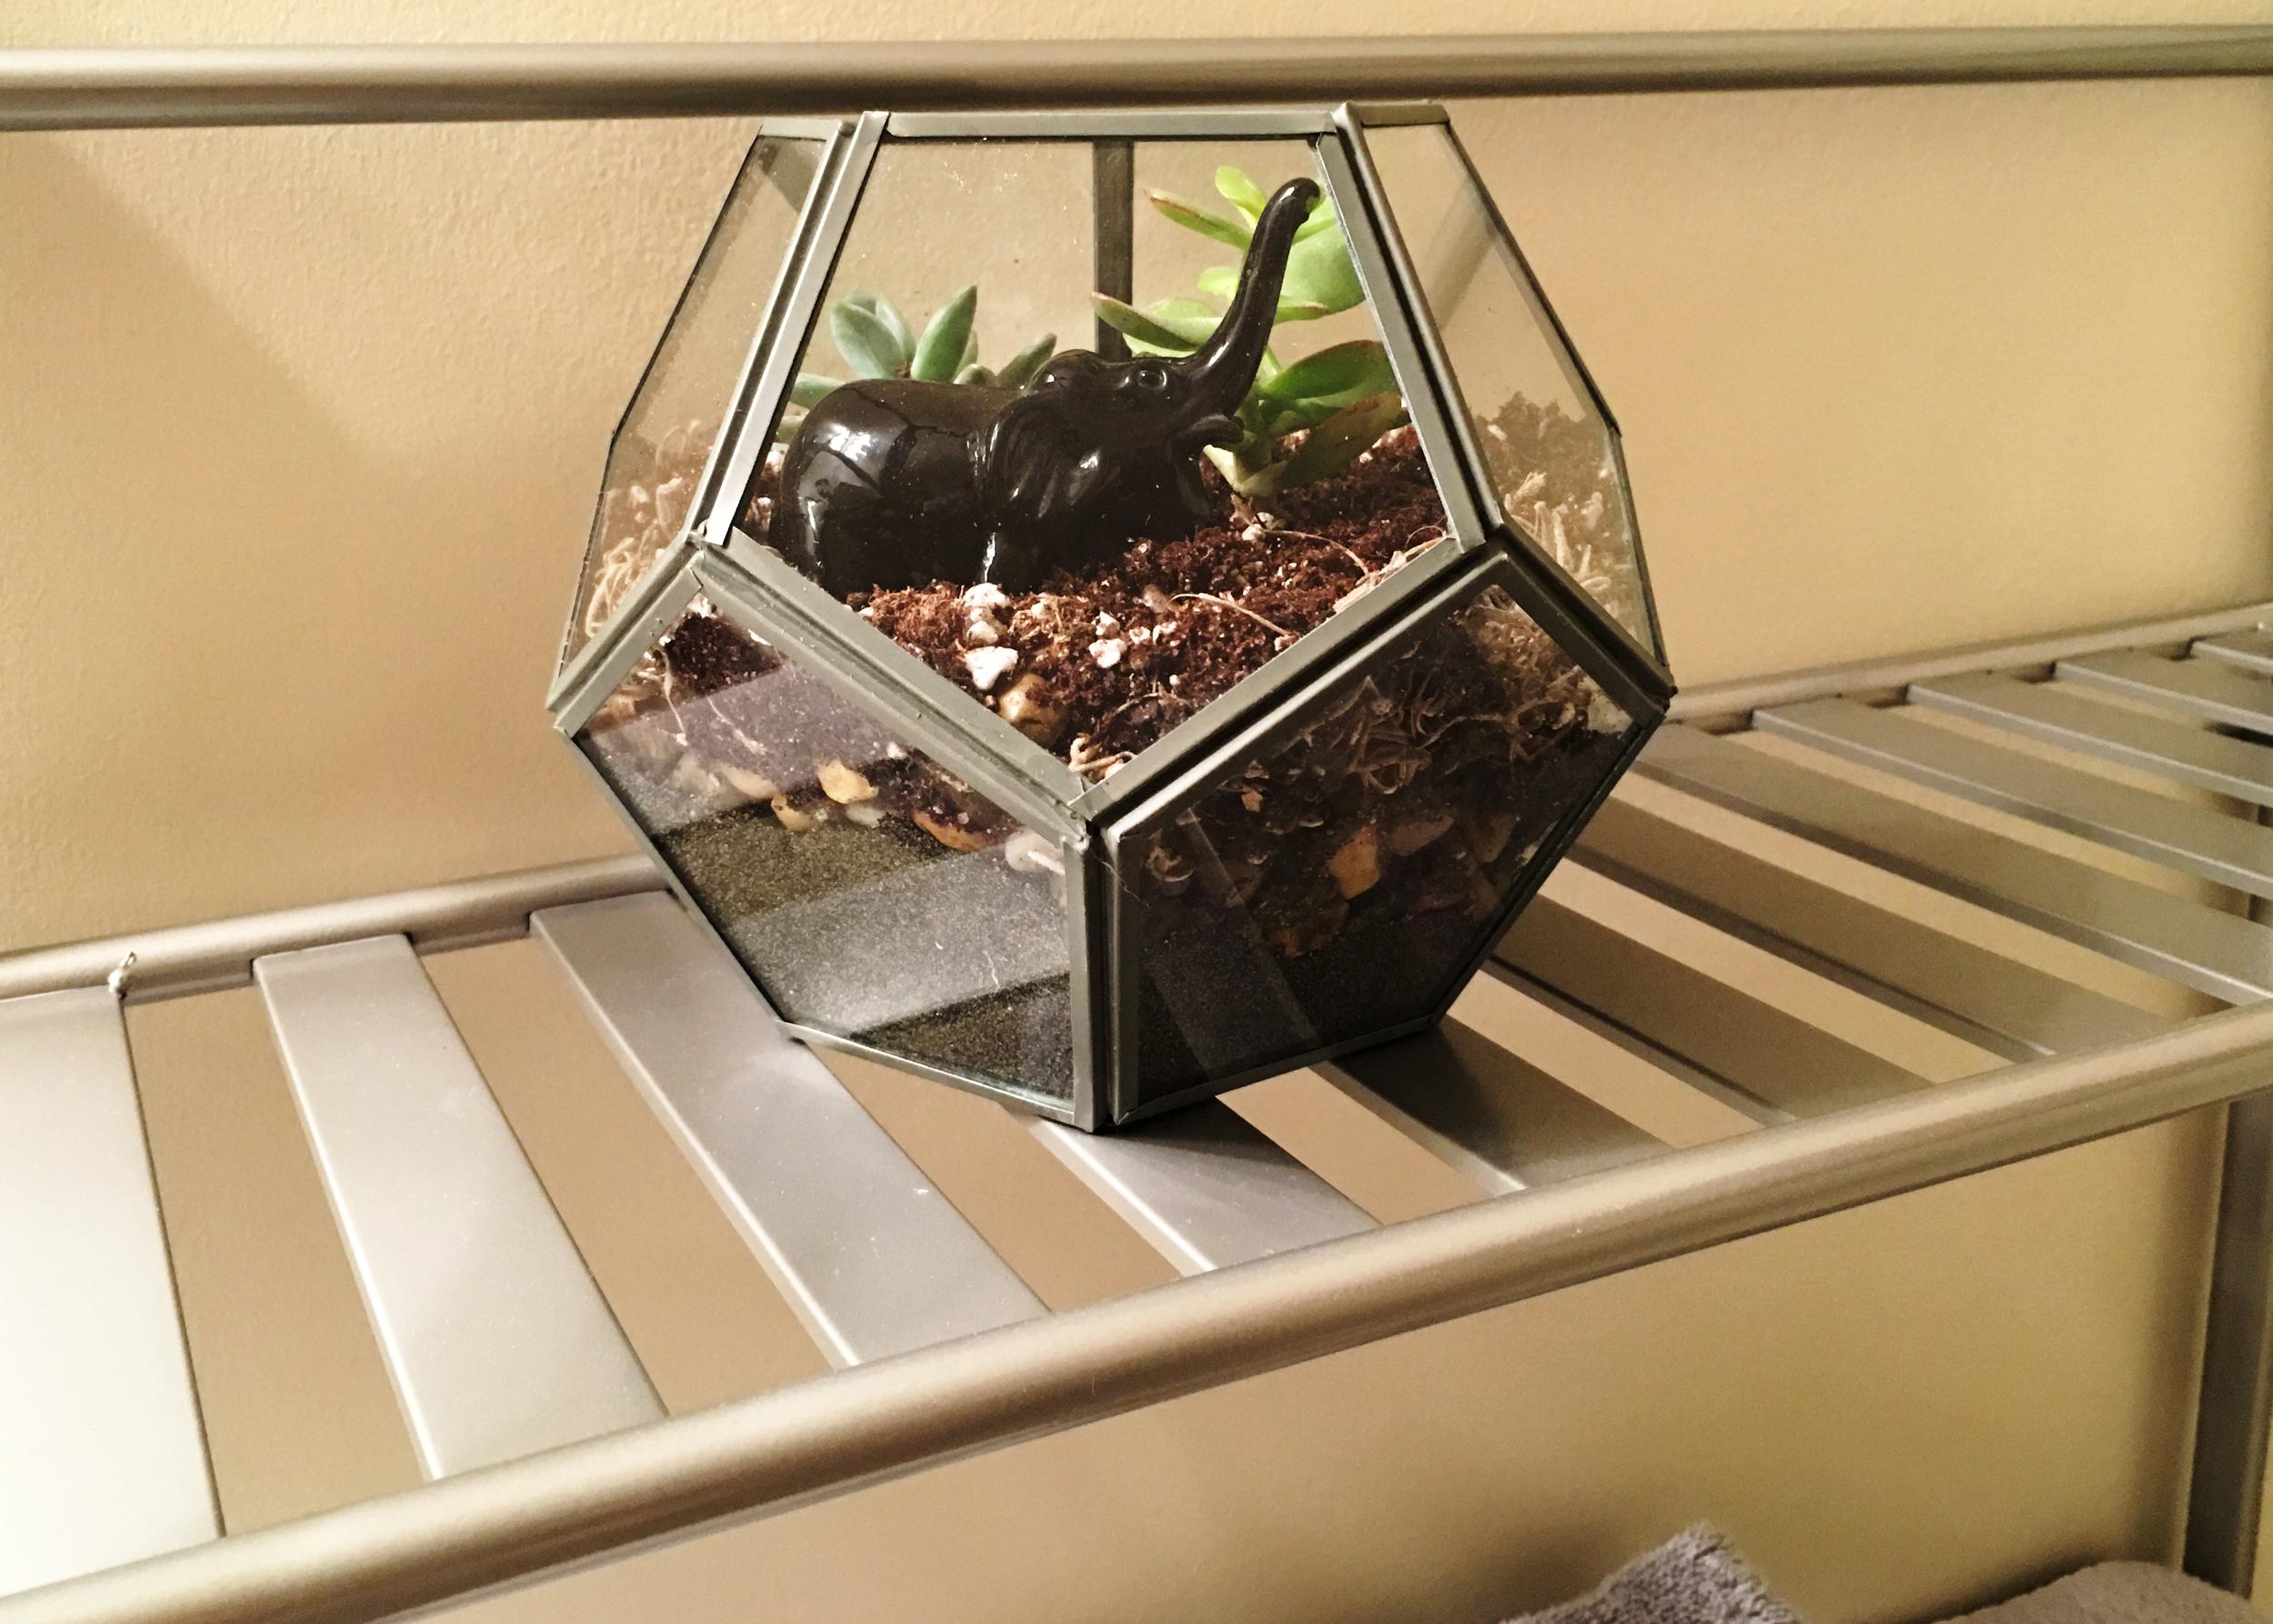 sam-c-perry-how-to-make-your-own-terrarium-final.jpg